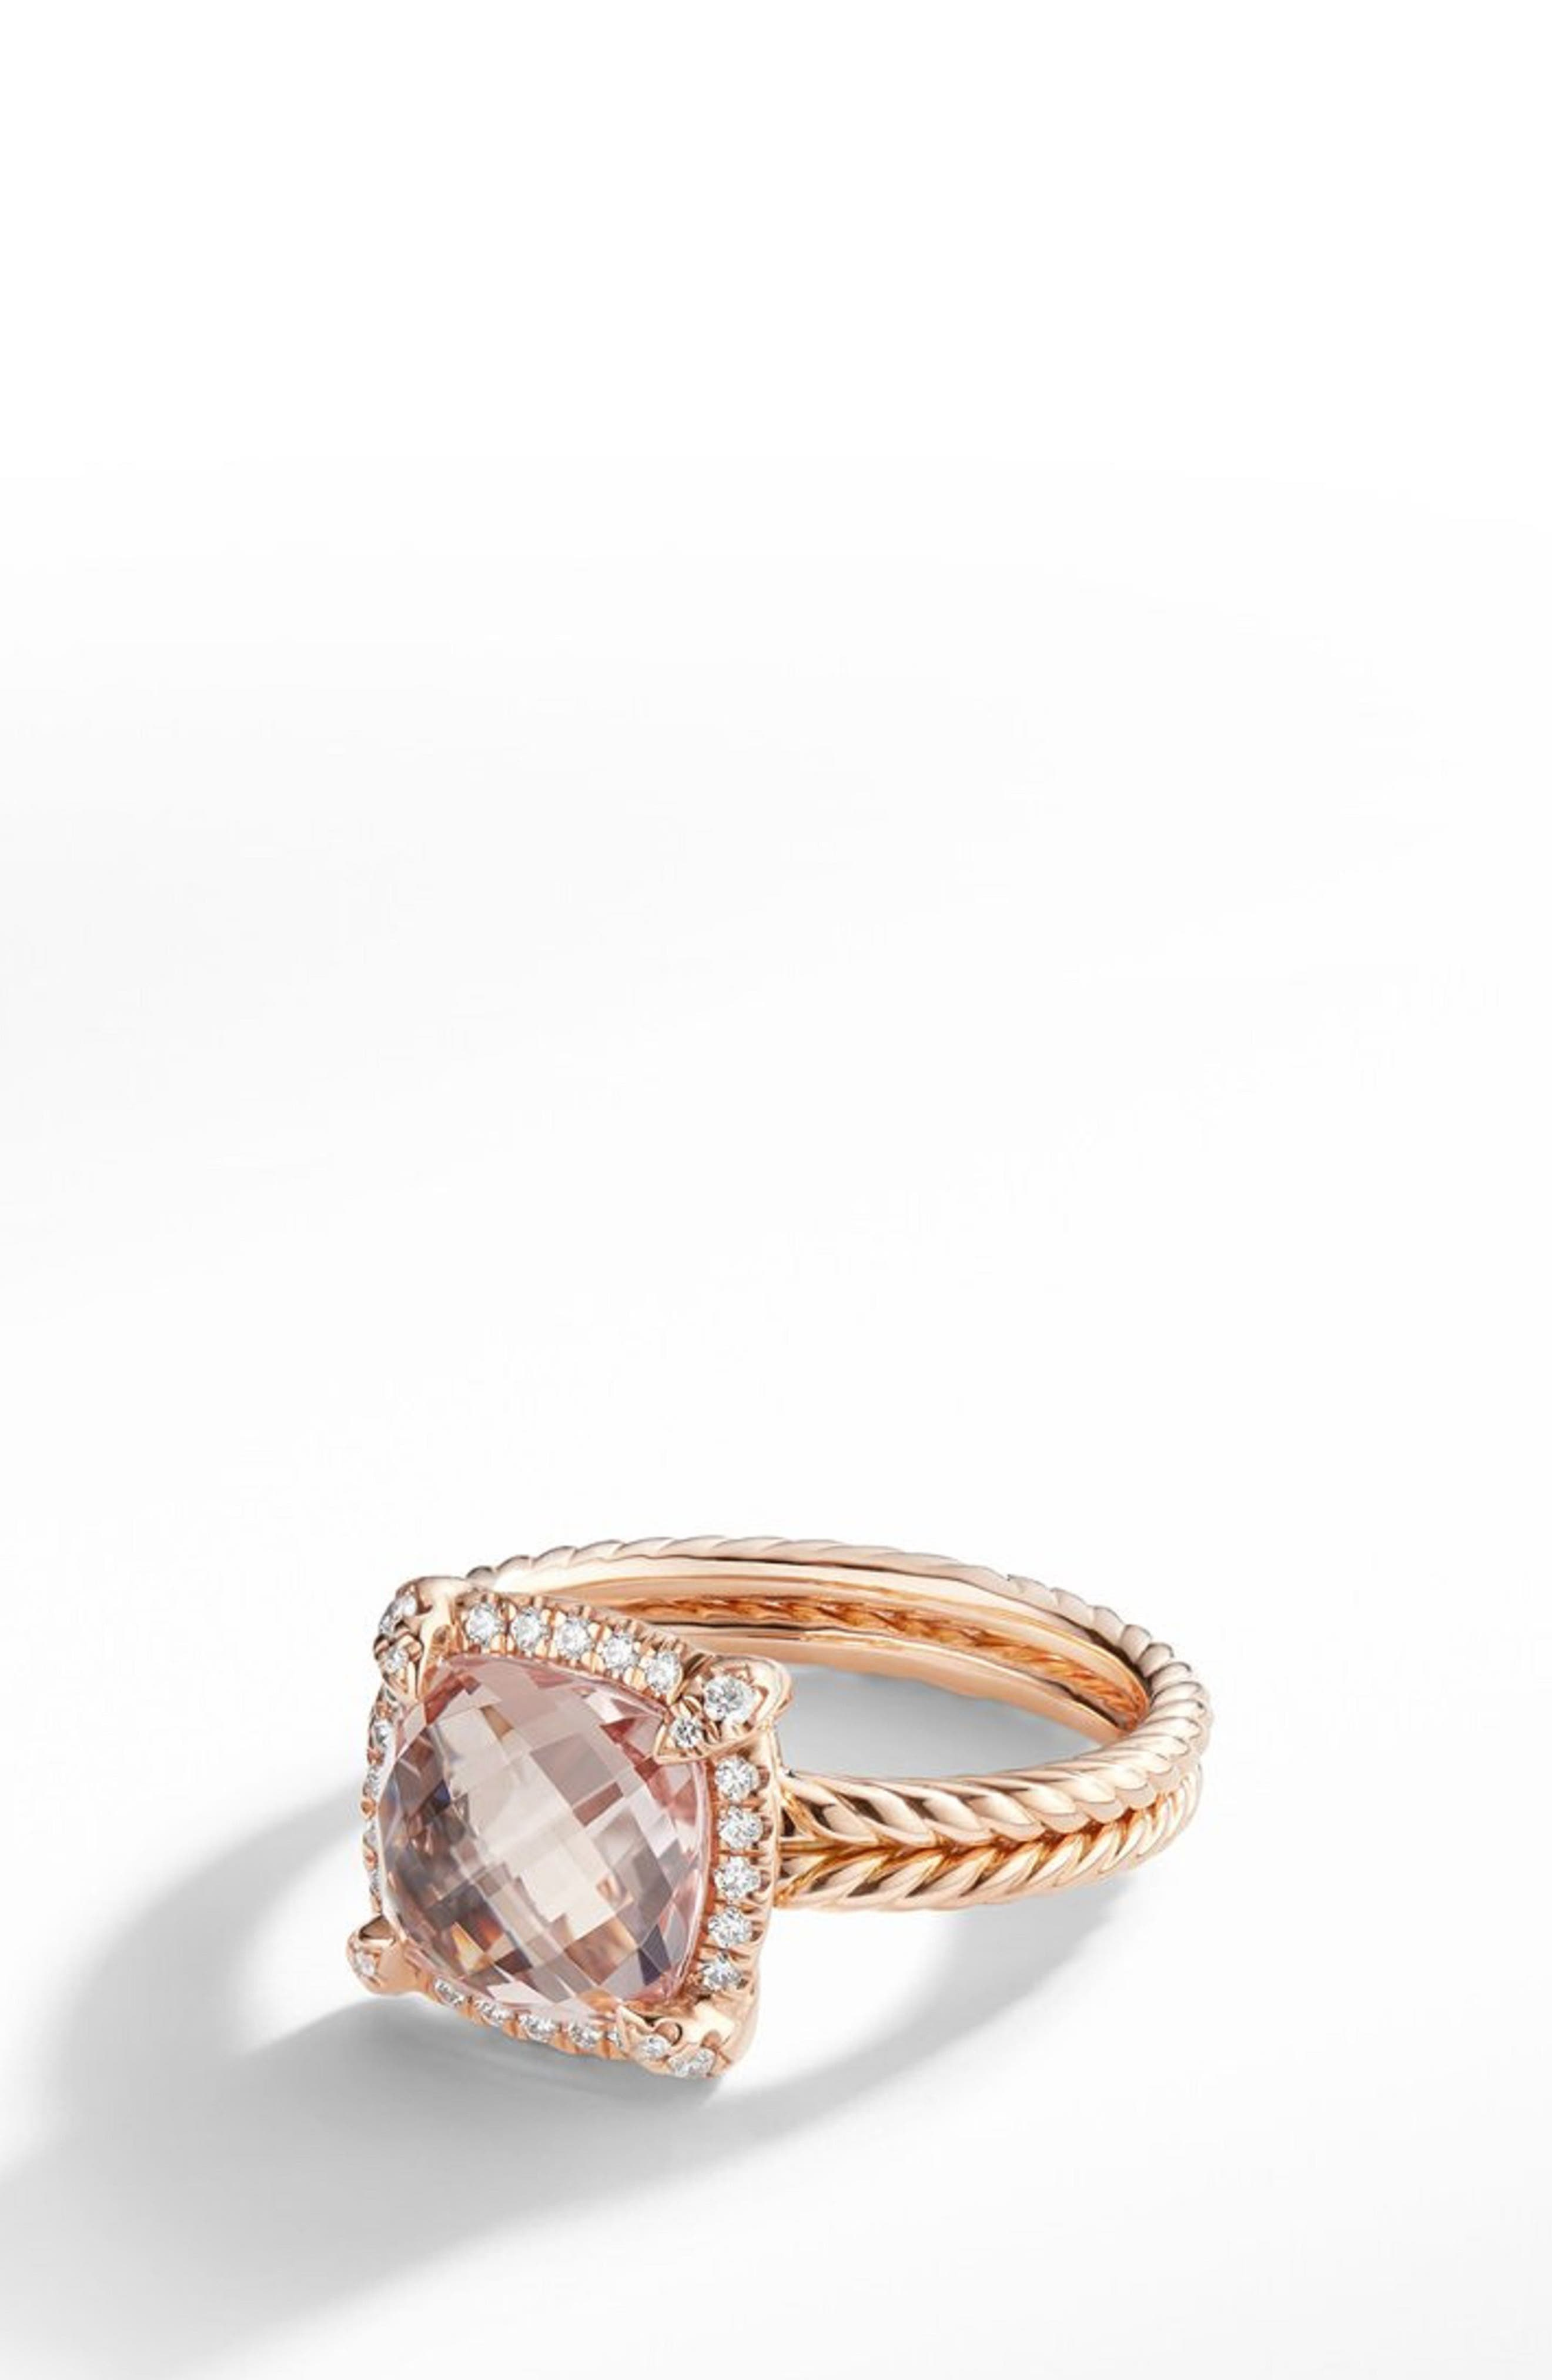 Chatelaine<sup>®</sup> Pavé Bezel Ring in 18K Rose Gold,                             Main thumbnail 1, color,                             ROSE GOLD/ DIAMOND/ MORGANITE